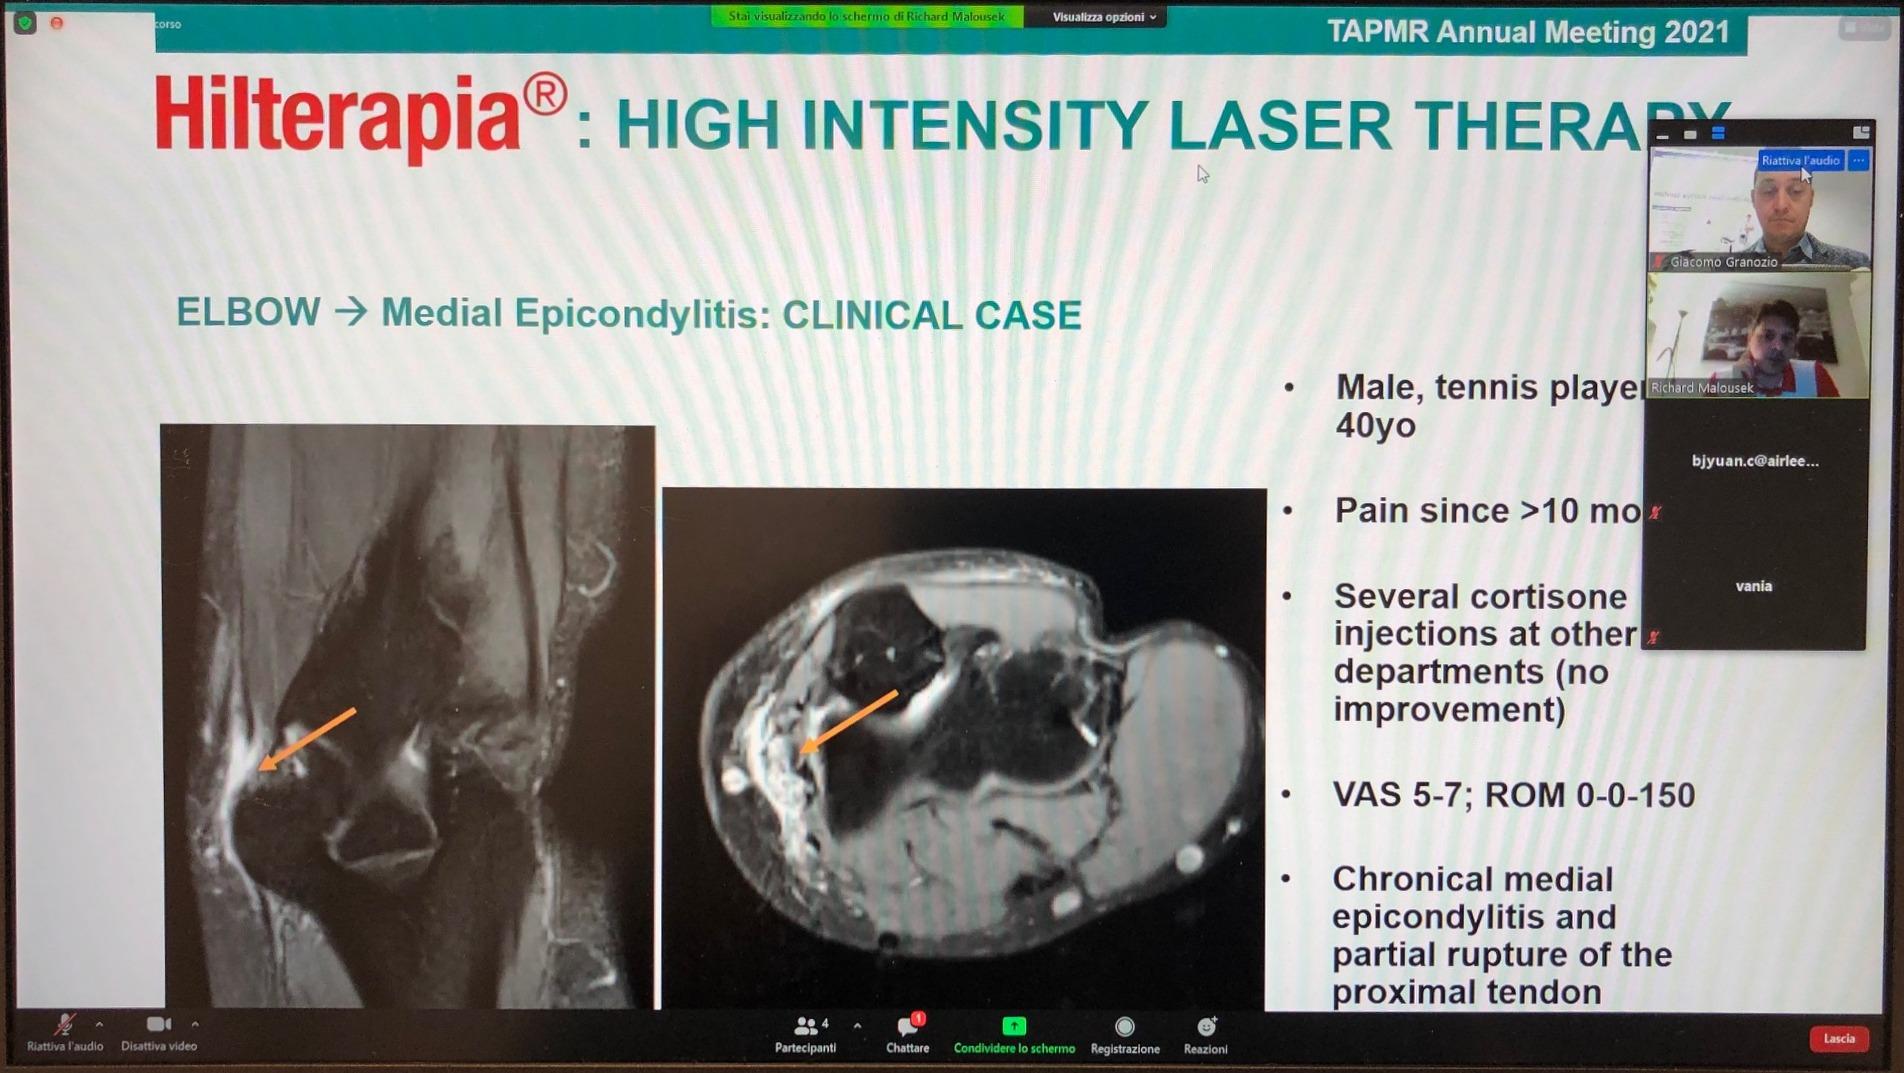 TAPRM 2021 - Hilterapia webinar with Dr Malousek